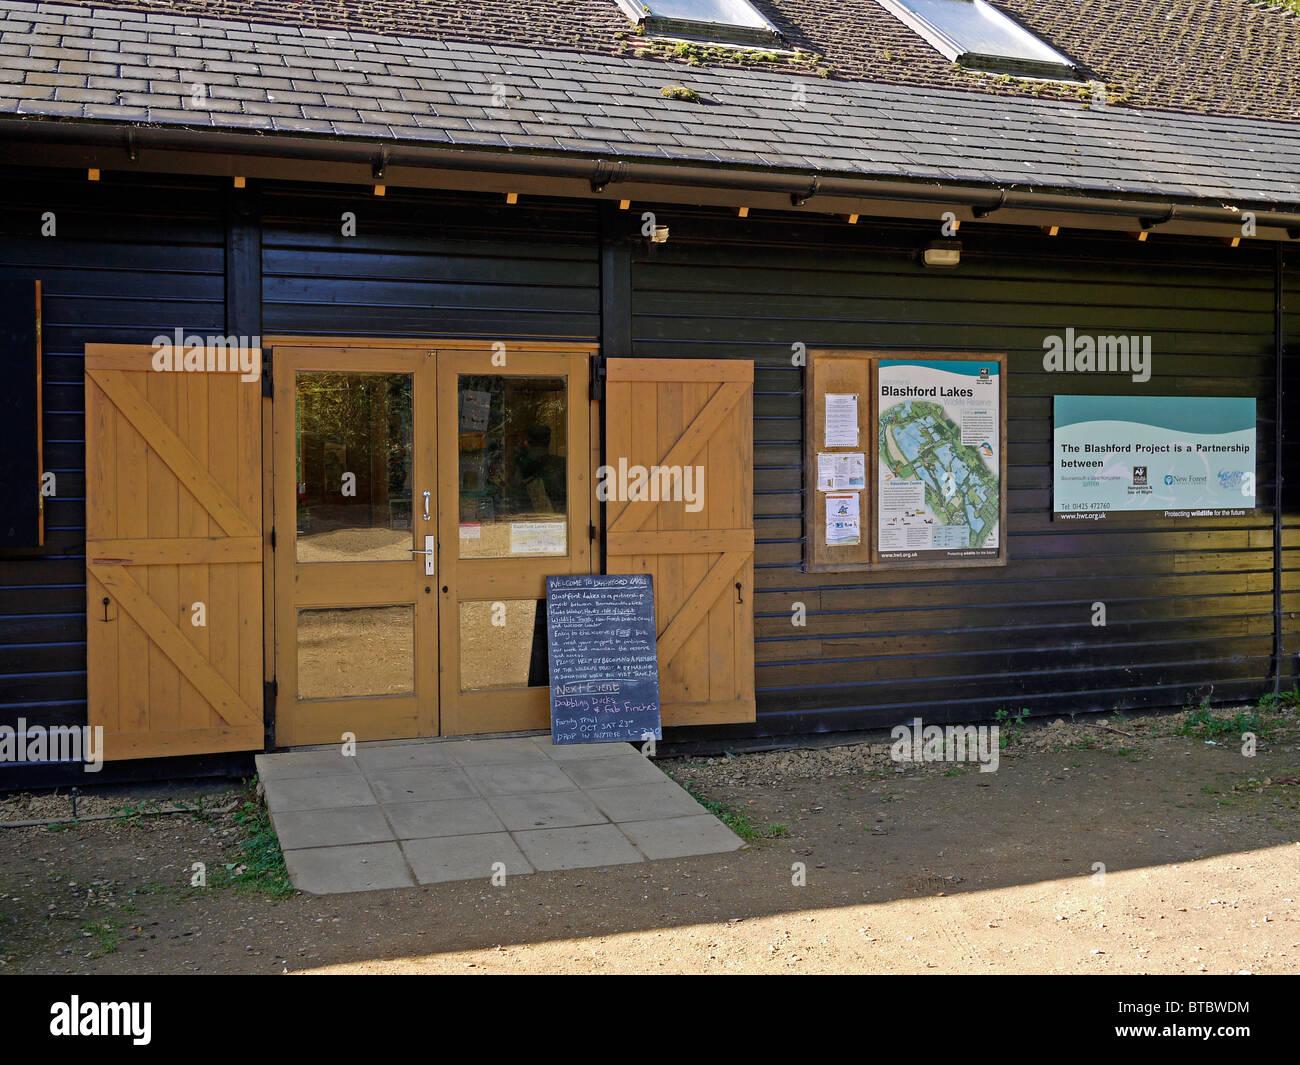 Entrée de Blashford Lakes Study Center, Hampshire, Royaume-Uni Photo Stock